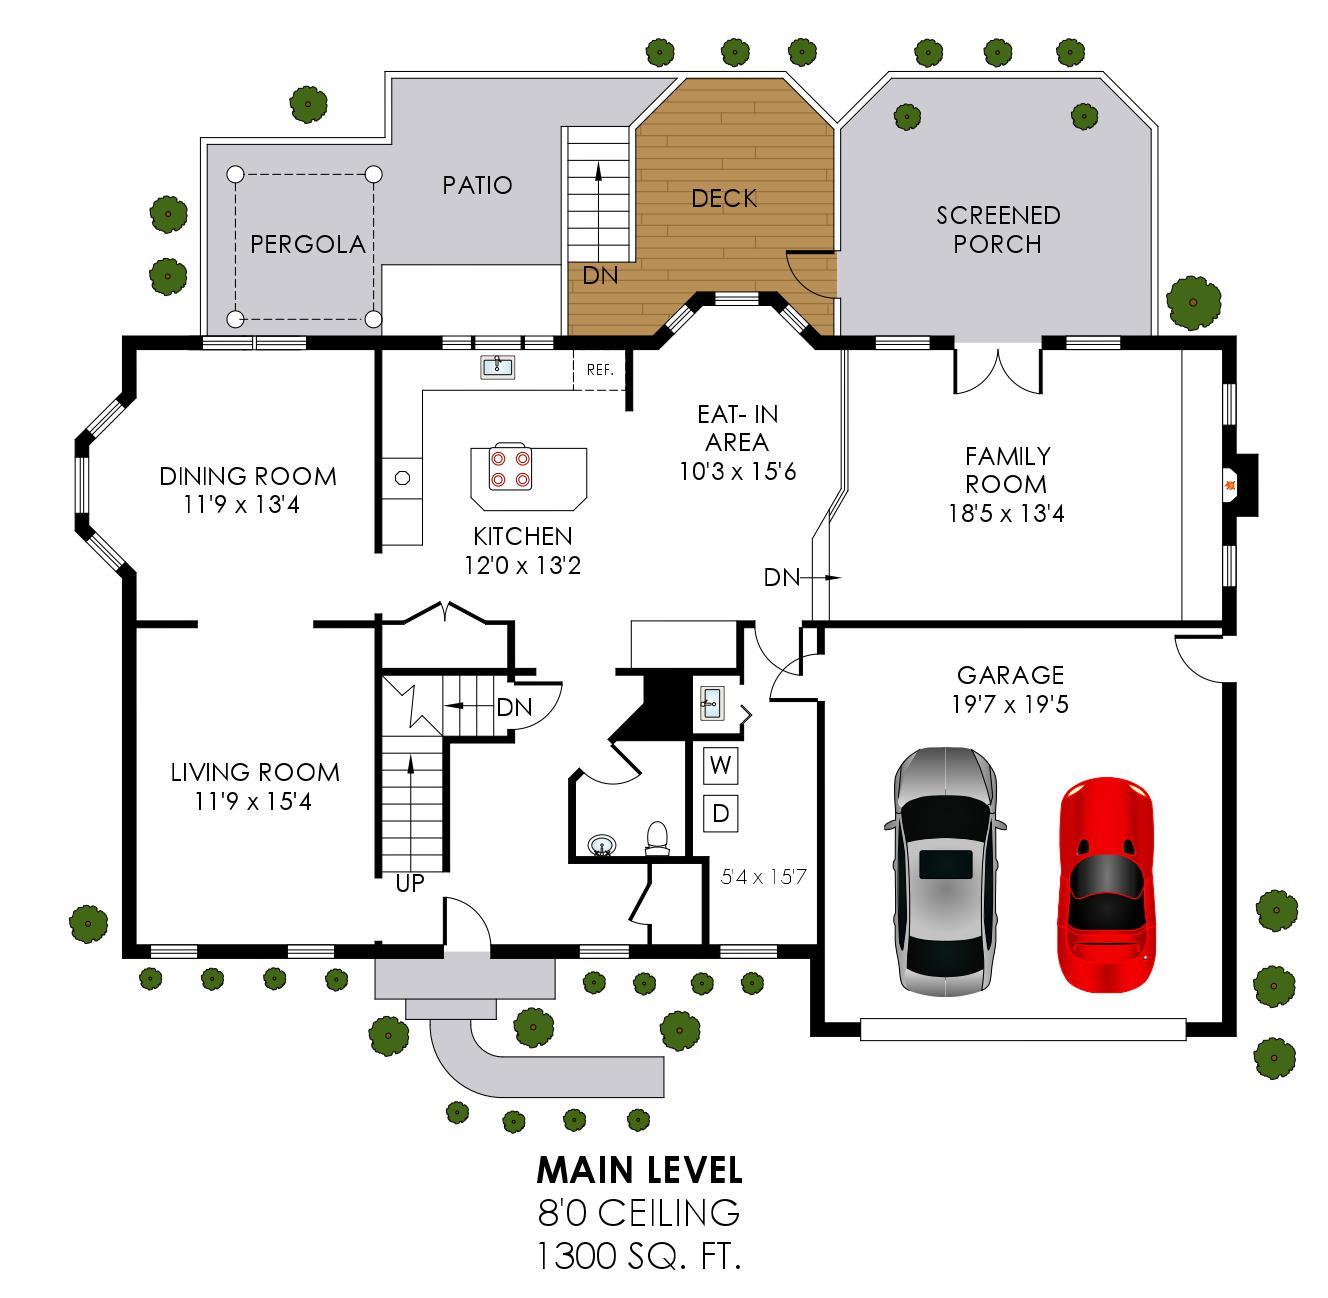 43459 Ridgeview Pl Ashburn Farm - Main Level Floor Plan